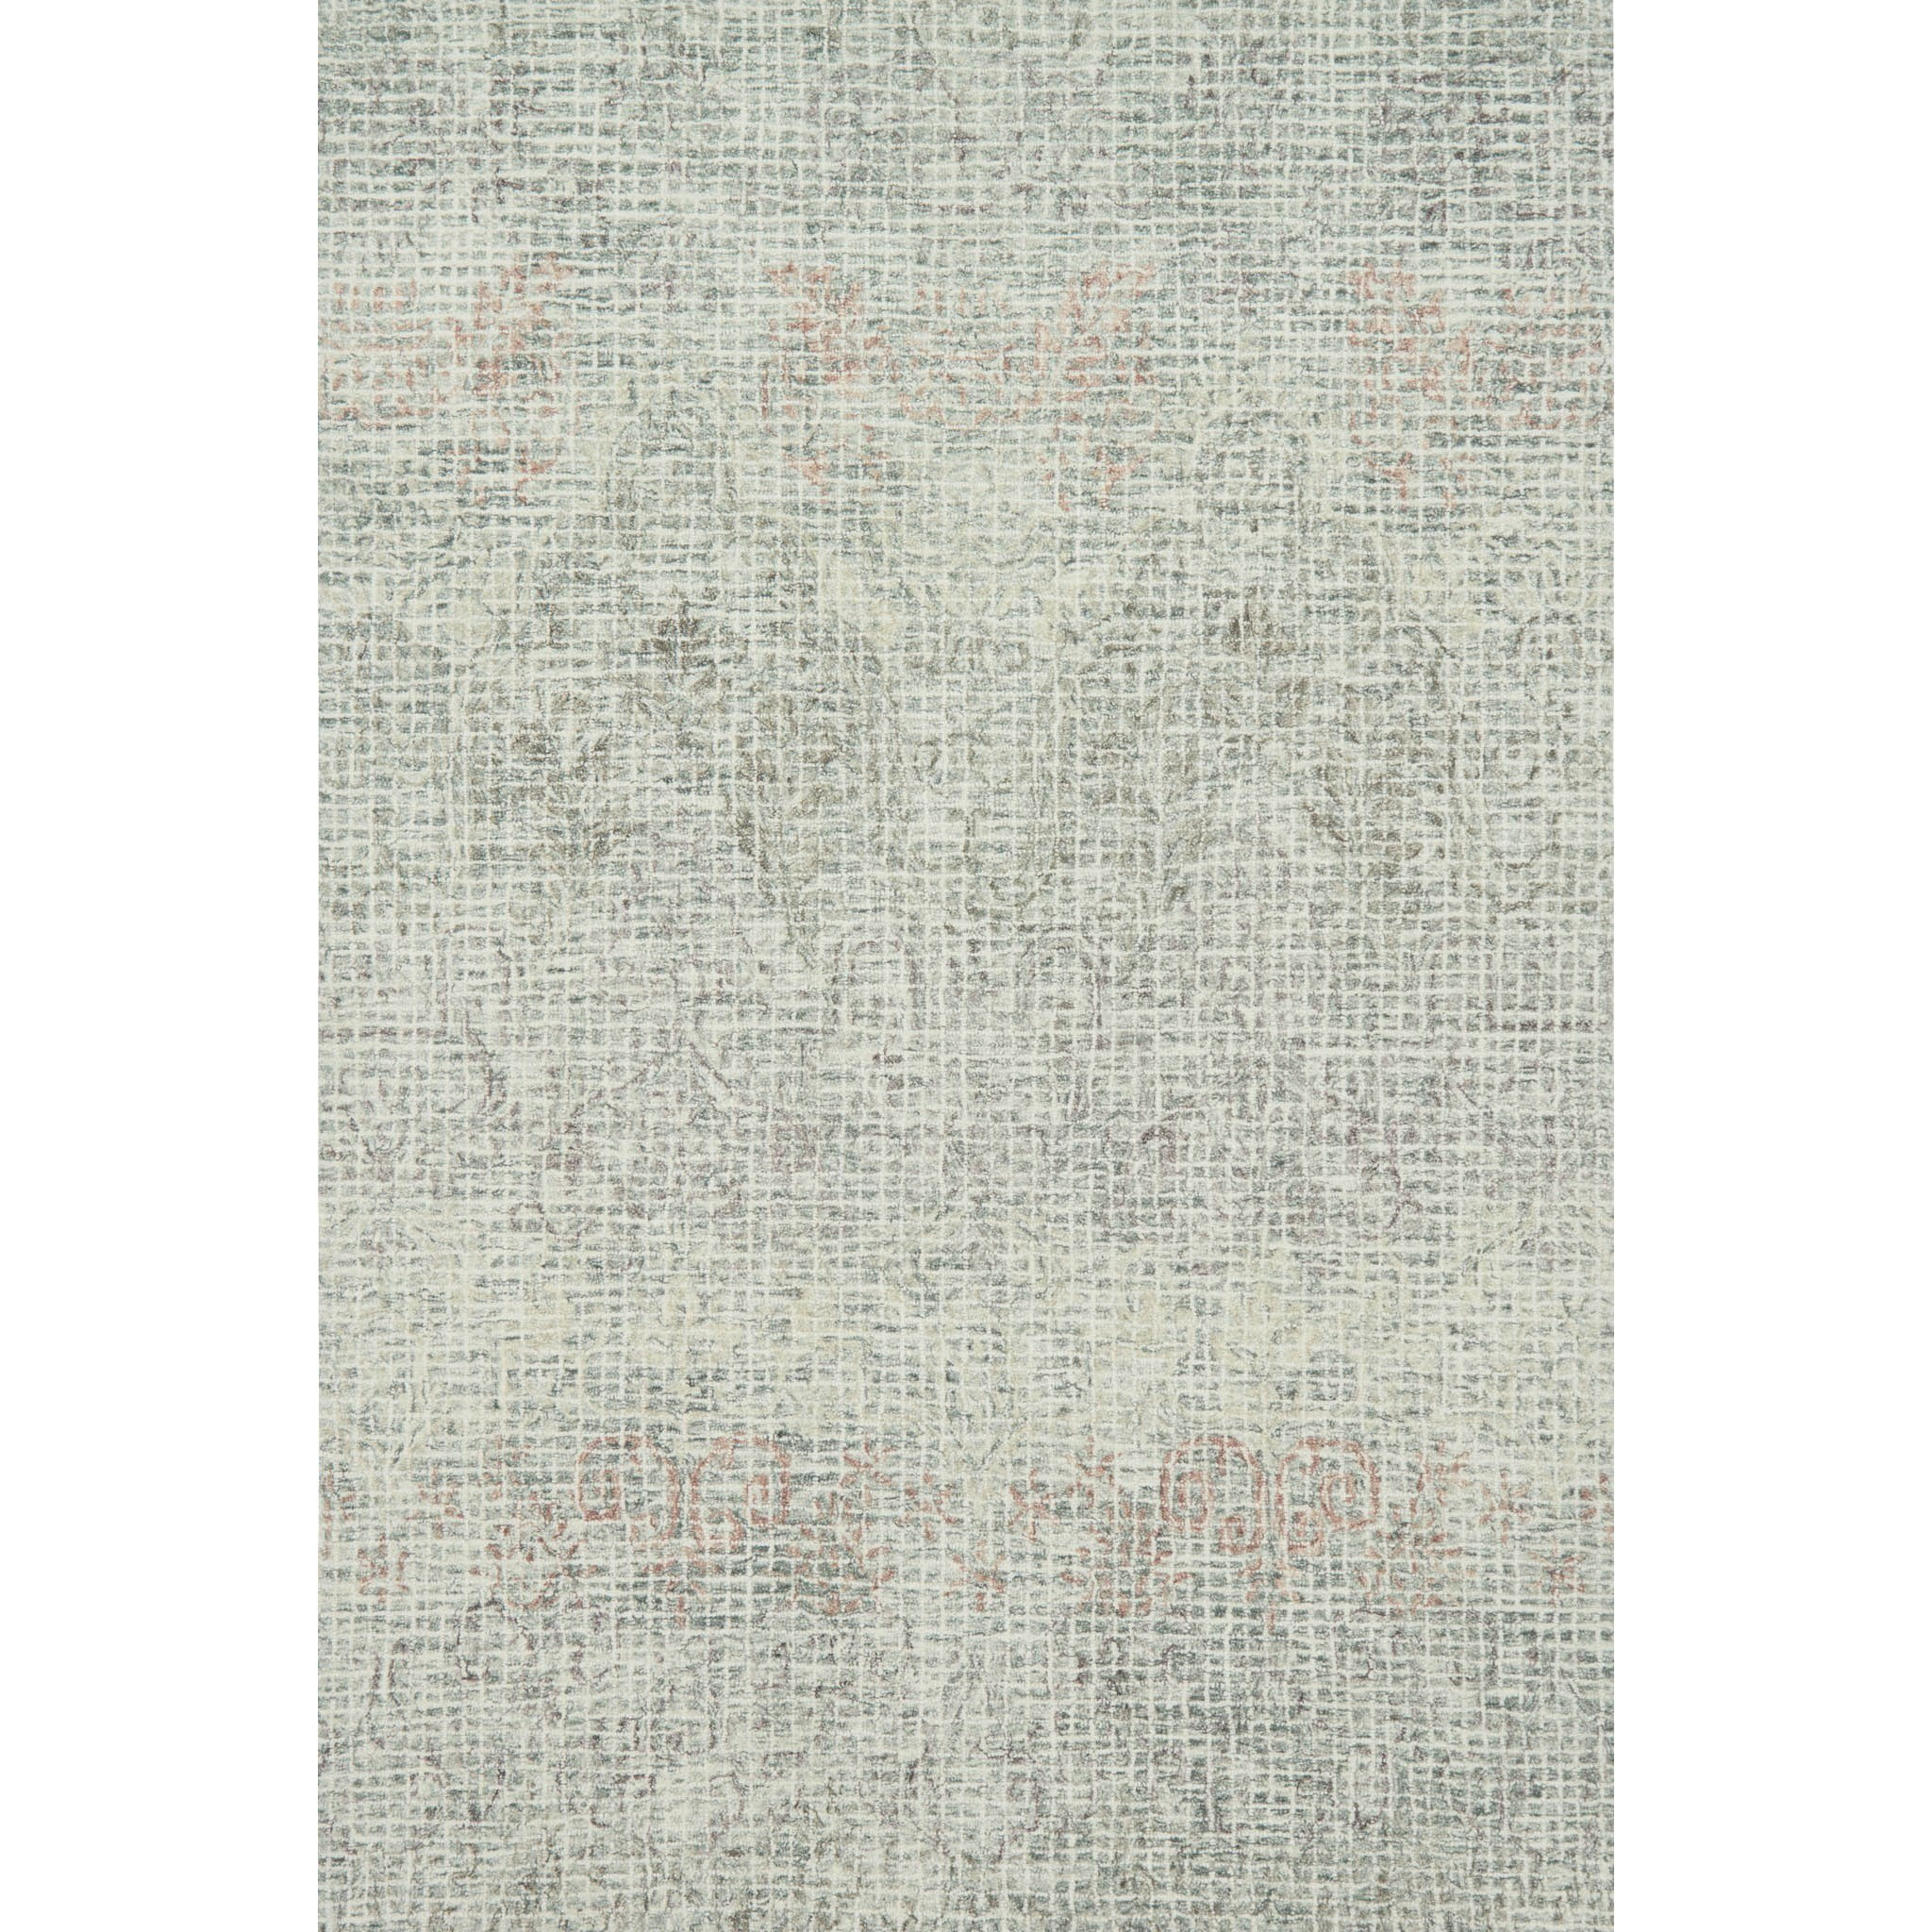 "Tatum 9'-3"" X 13' Area Rug by Loloi Rugs at Virginia Furniture Market"